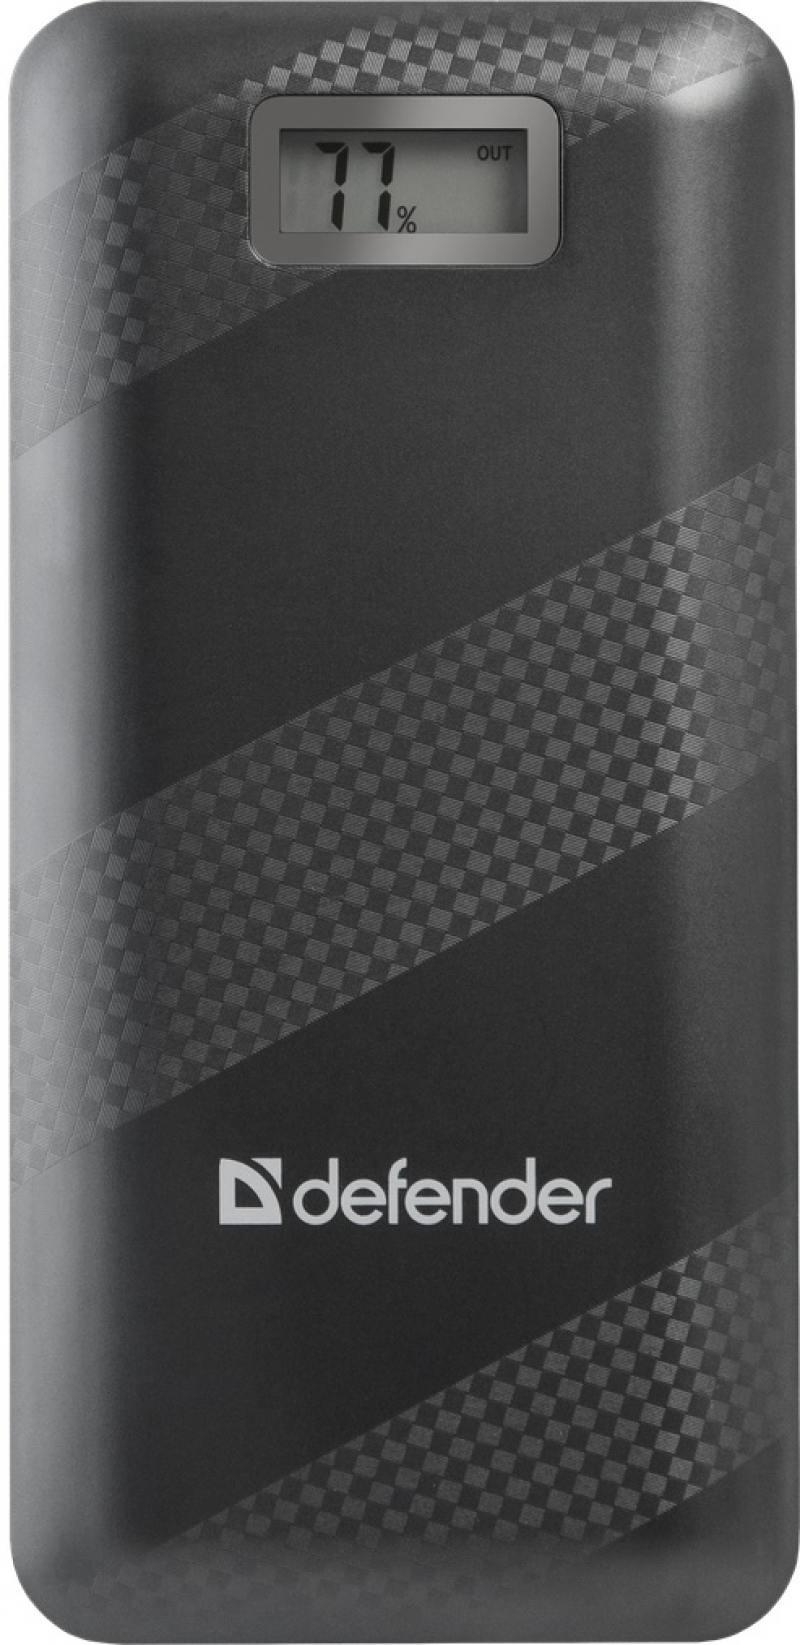 все цены на Внешний аккумулятор Defender Lavita 20000 Black (83635) онлайн